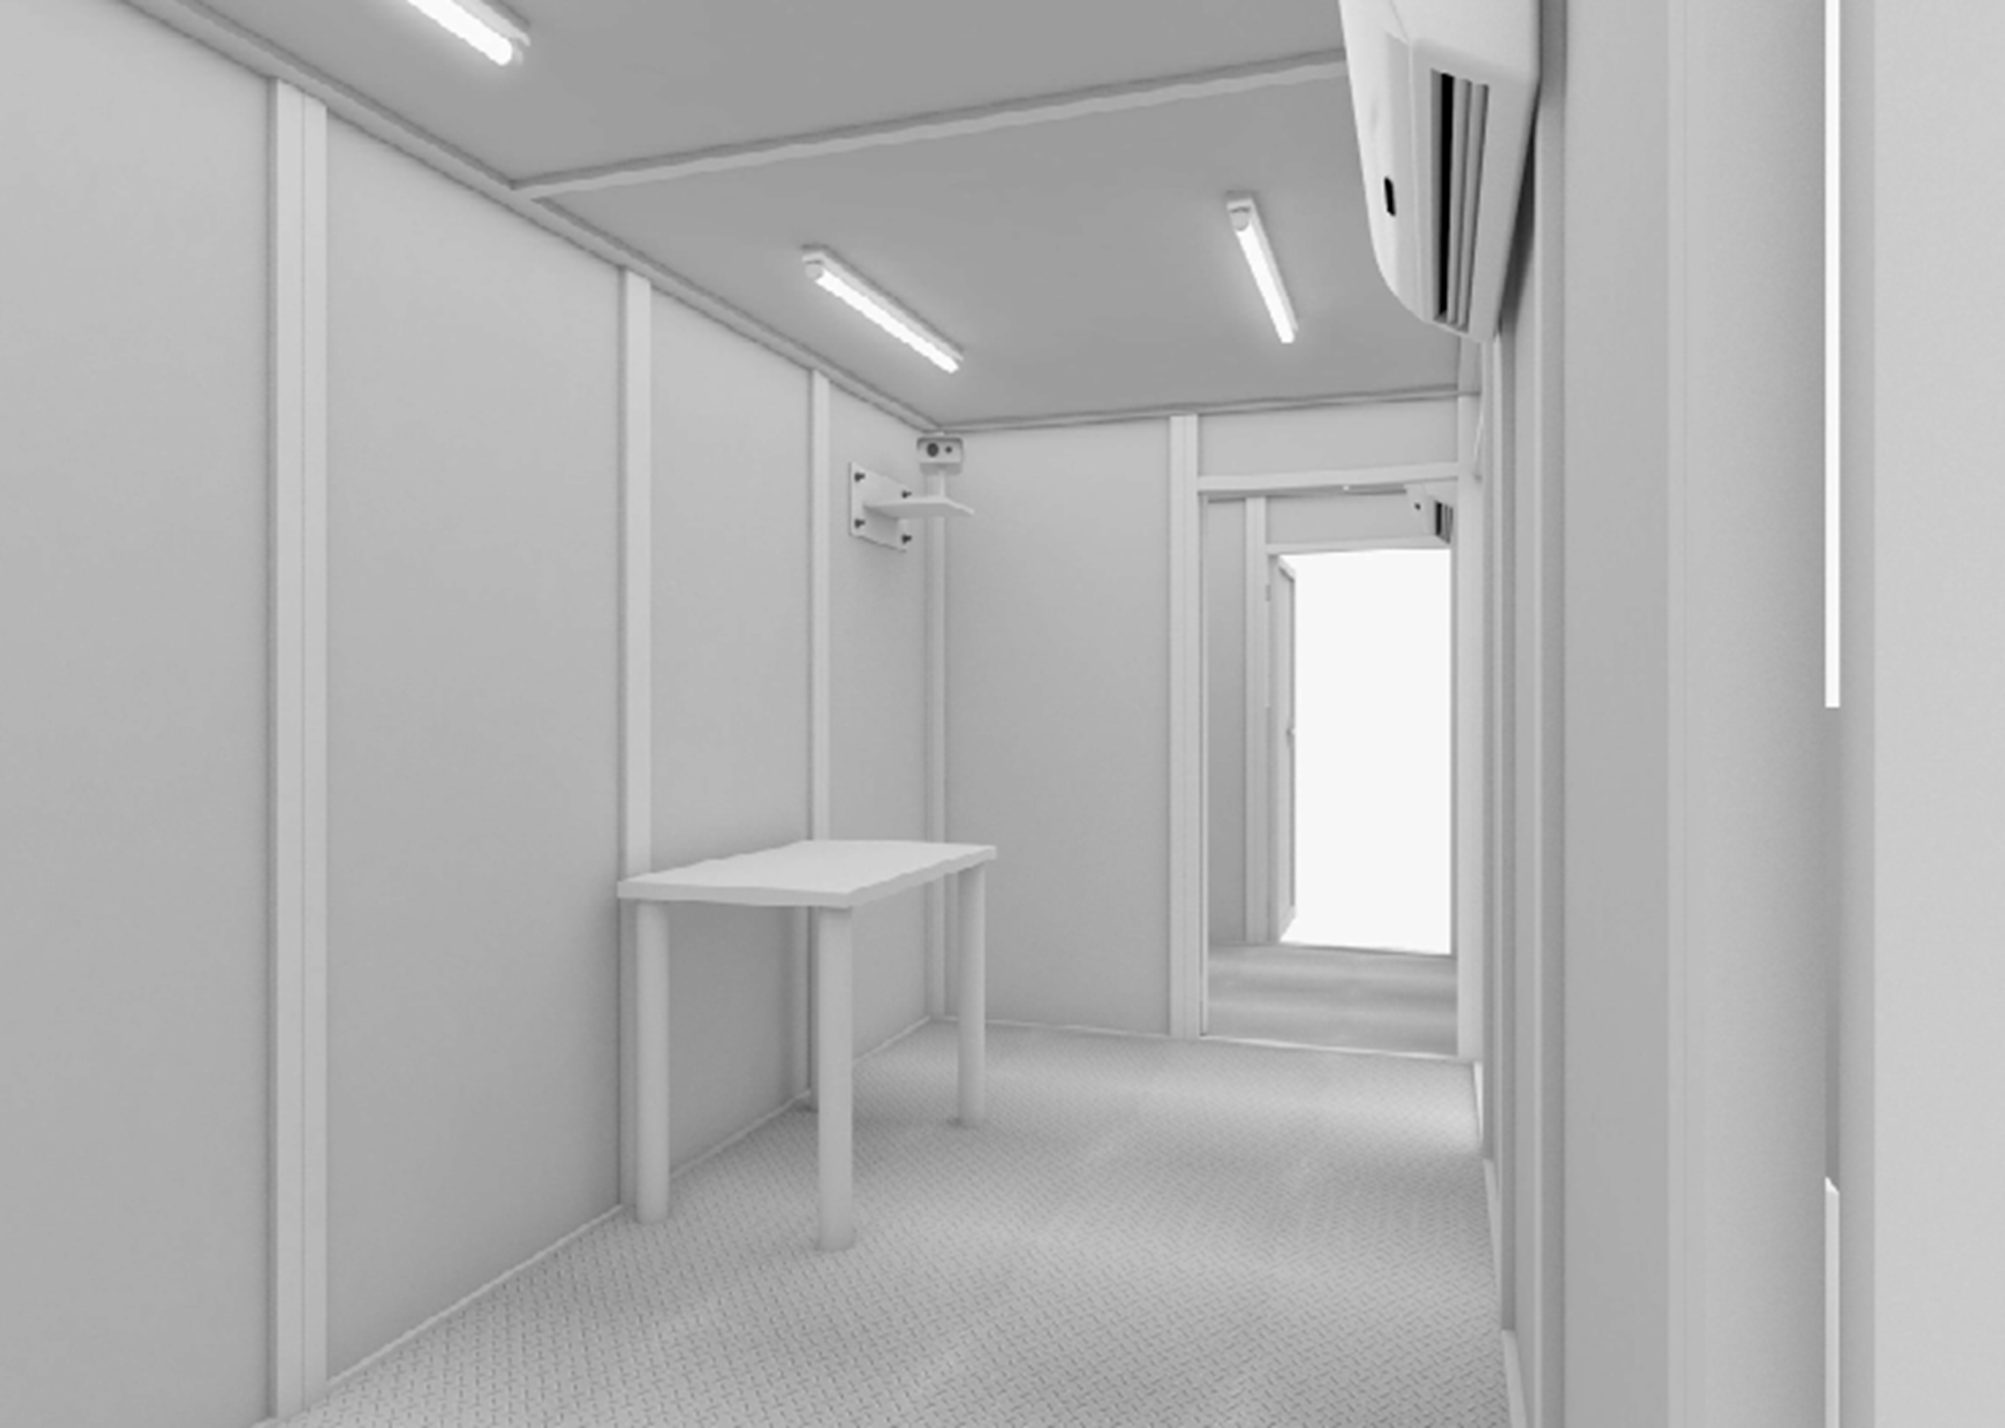 Gaz_G9603 Thermal Screening Cabin - Thermal Screening Cabin